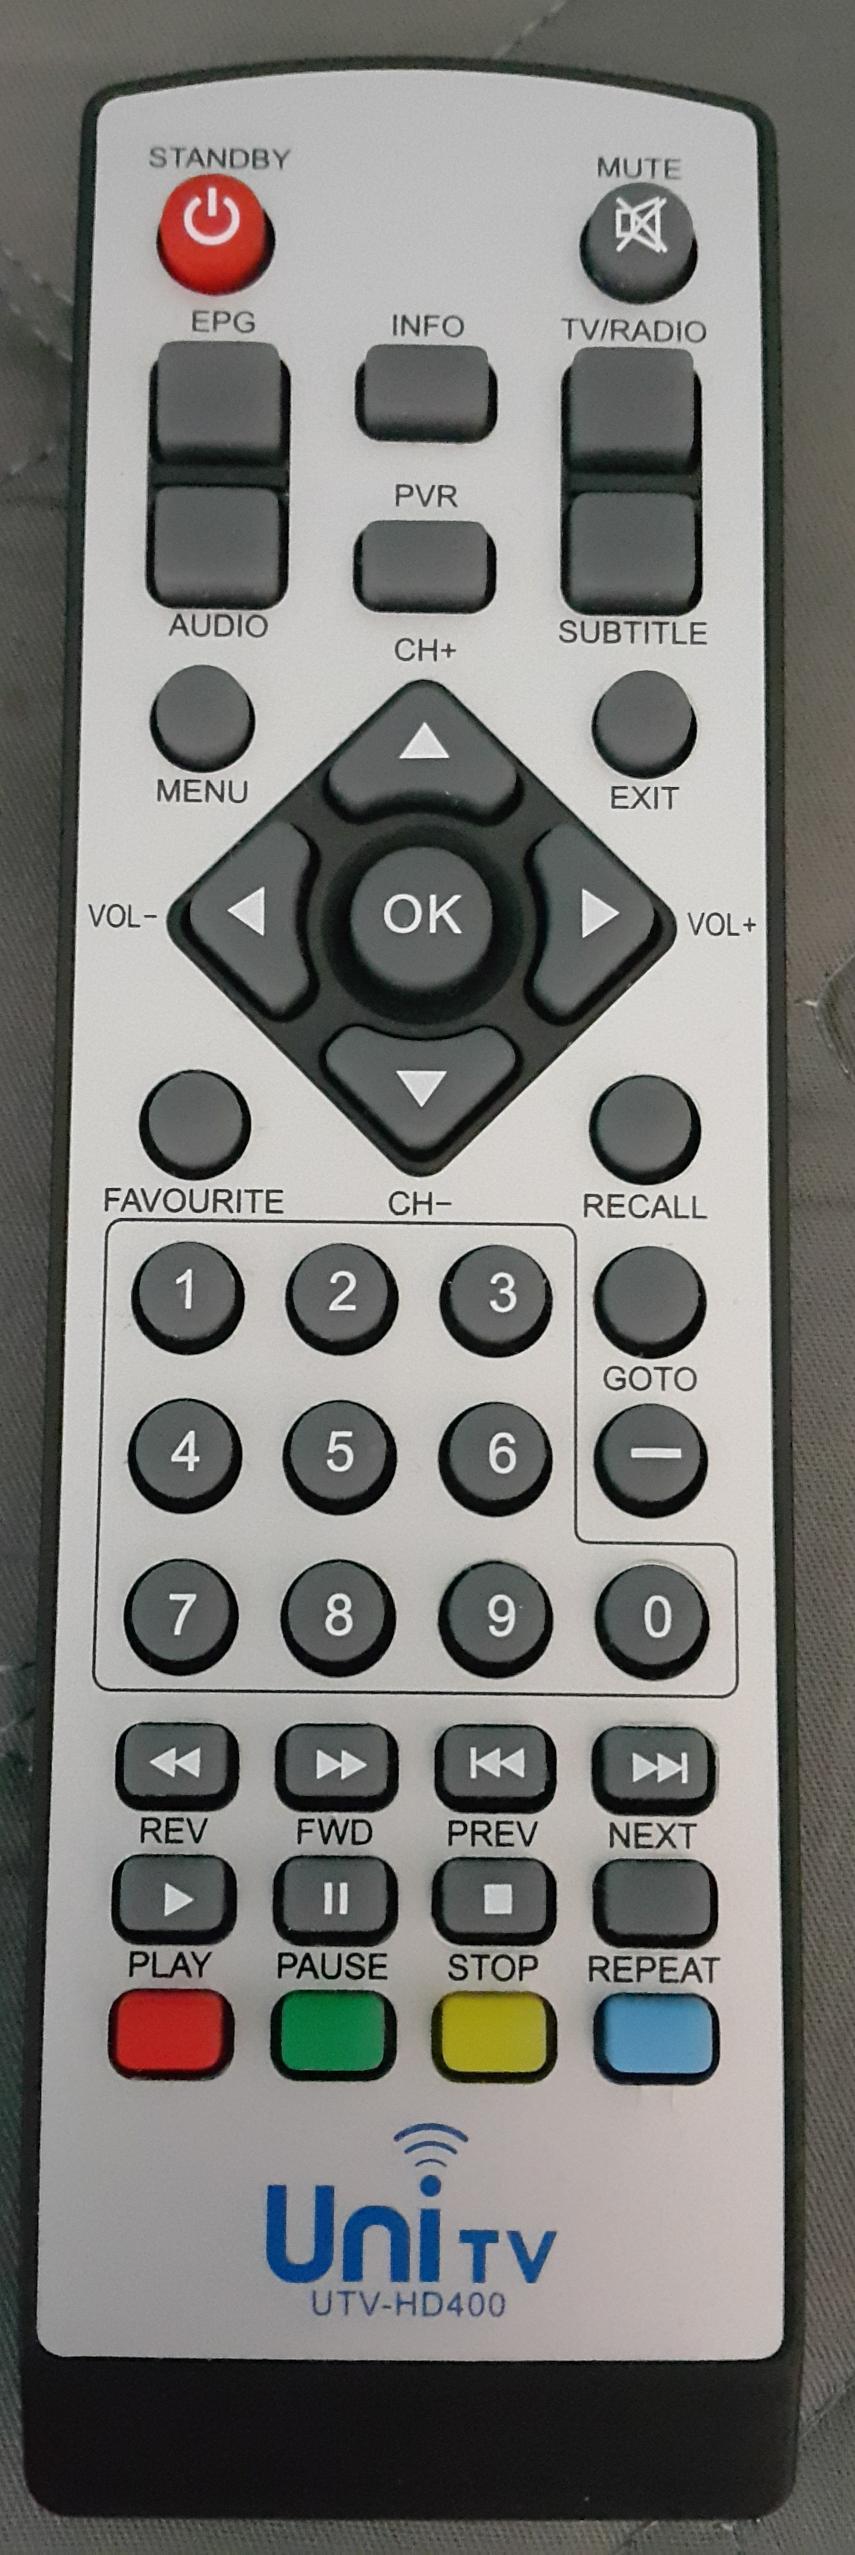 UNIMTEK_UTV-HD400-유니TV-유니엠텍-UTV-350-UTV-HD5000-UTV-300_TV_cover.png